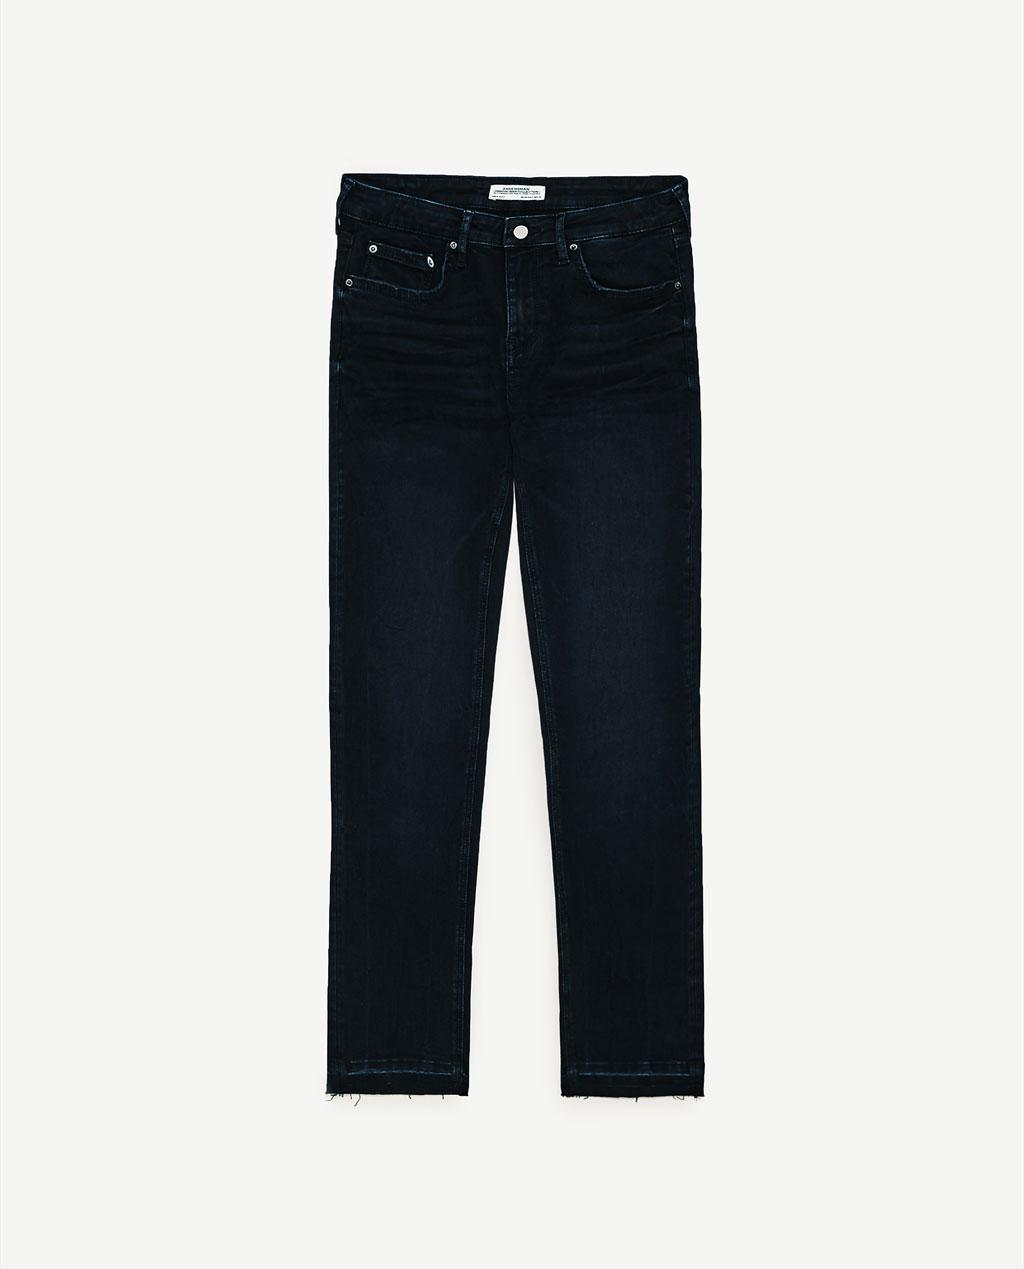 zara_mid_rise_deep_blue_jeans.jpg